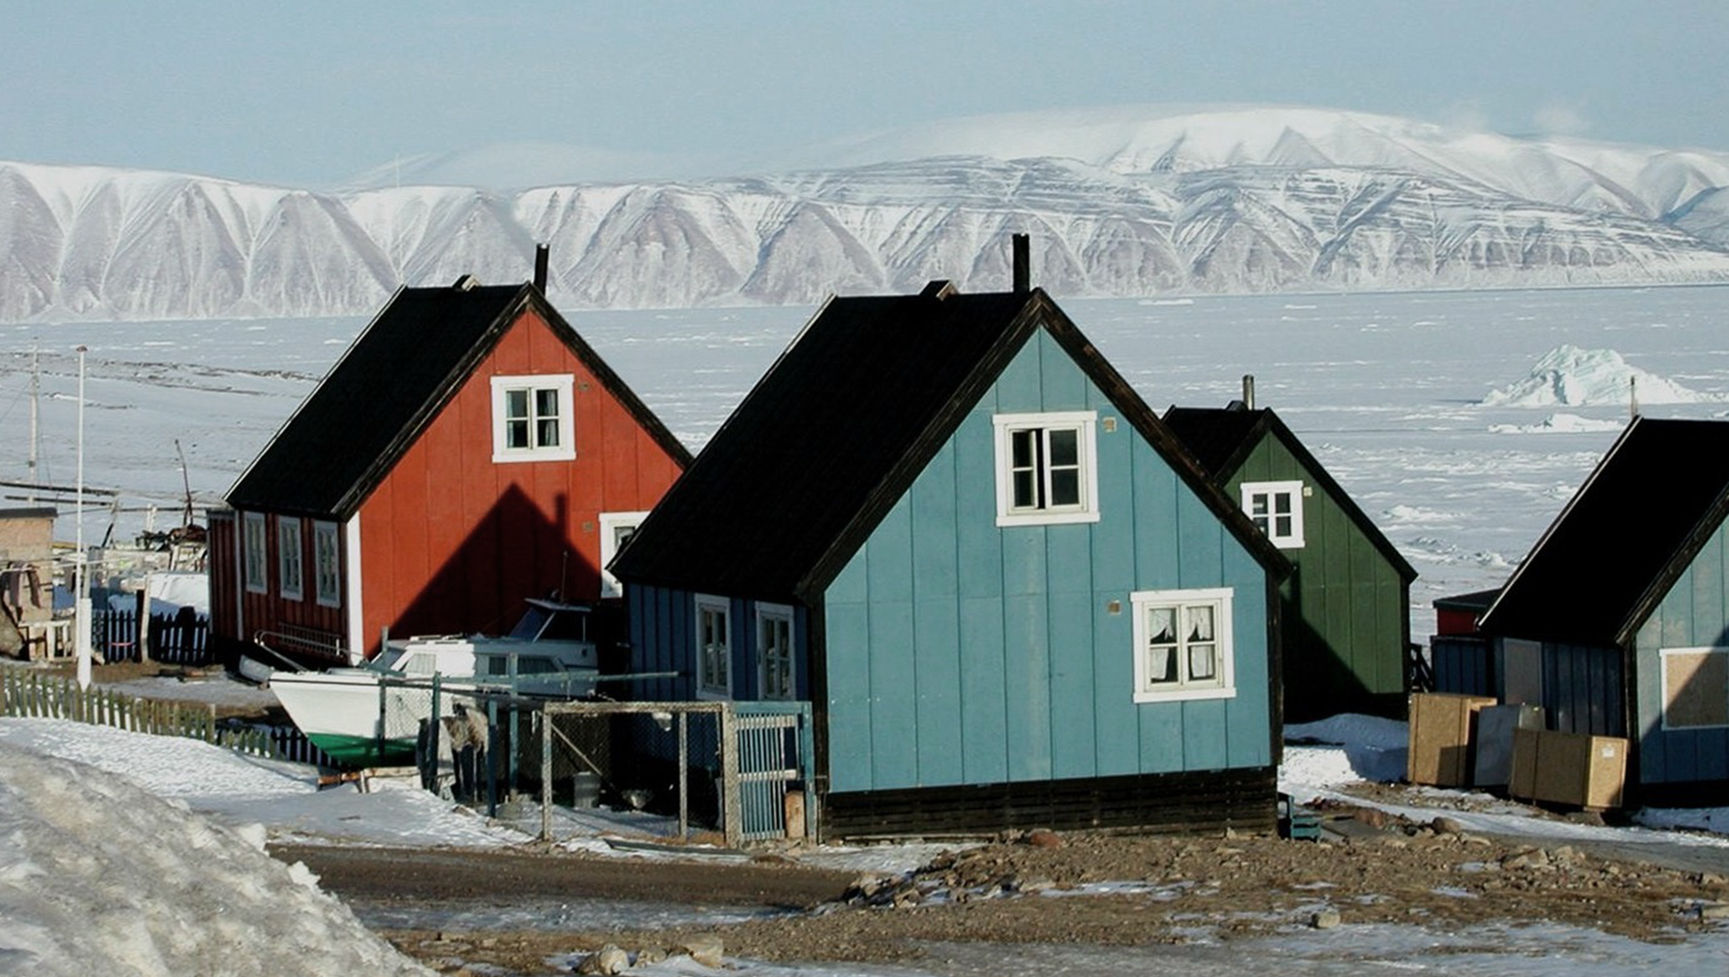 Hus Grønlandsbygd. Fotograf: ukjent.